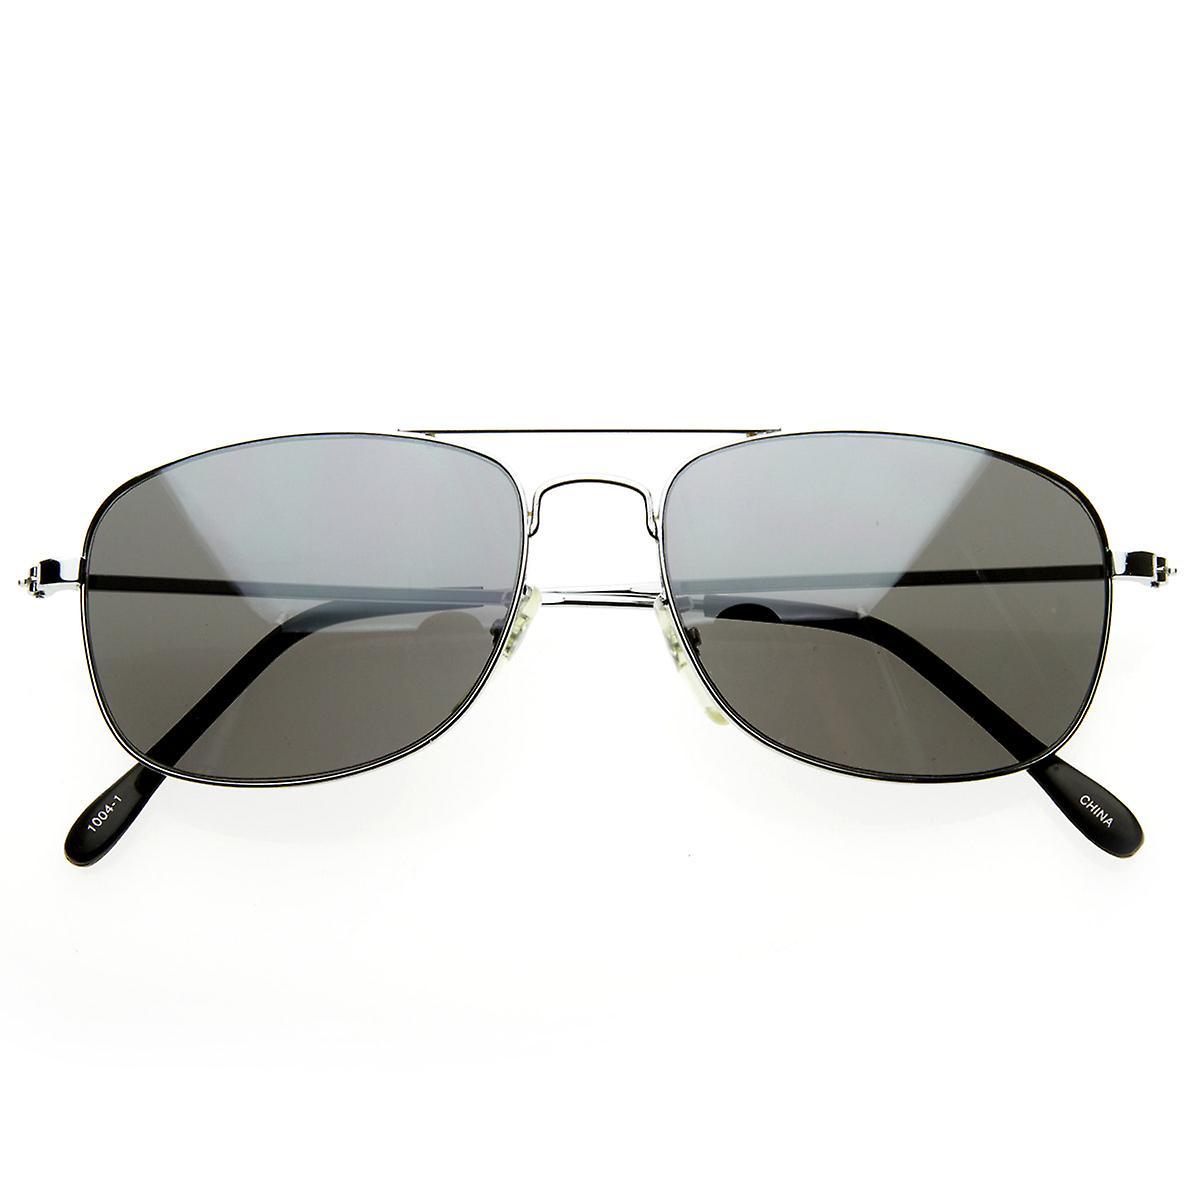 AVIATORS Classic Square Wire Metal Aviator Sunglasses w/ Mirrored Lens